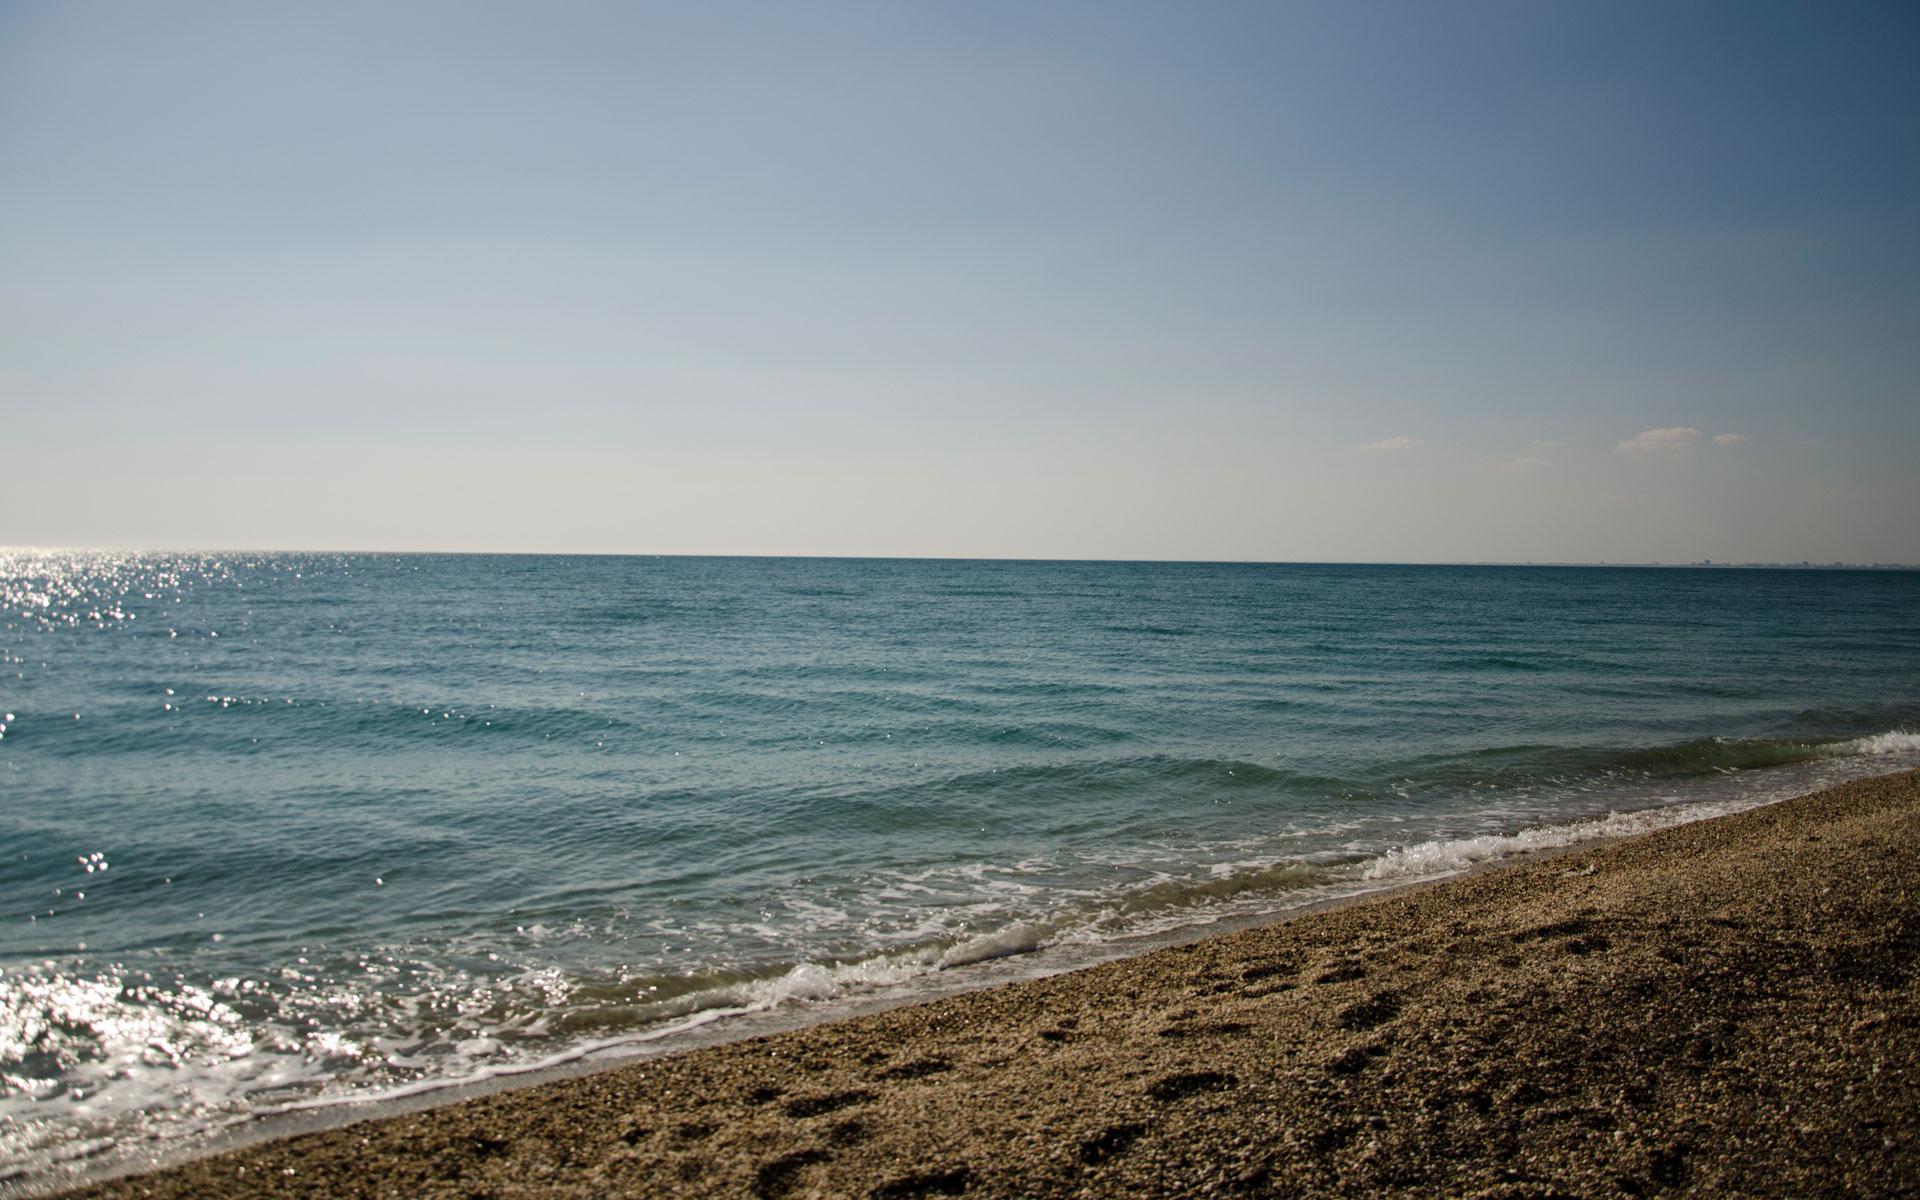 Картинки евпатория море, юлька днем